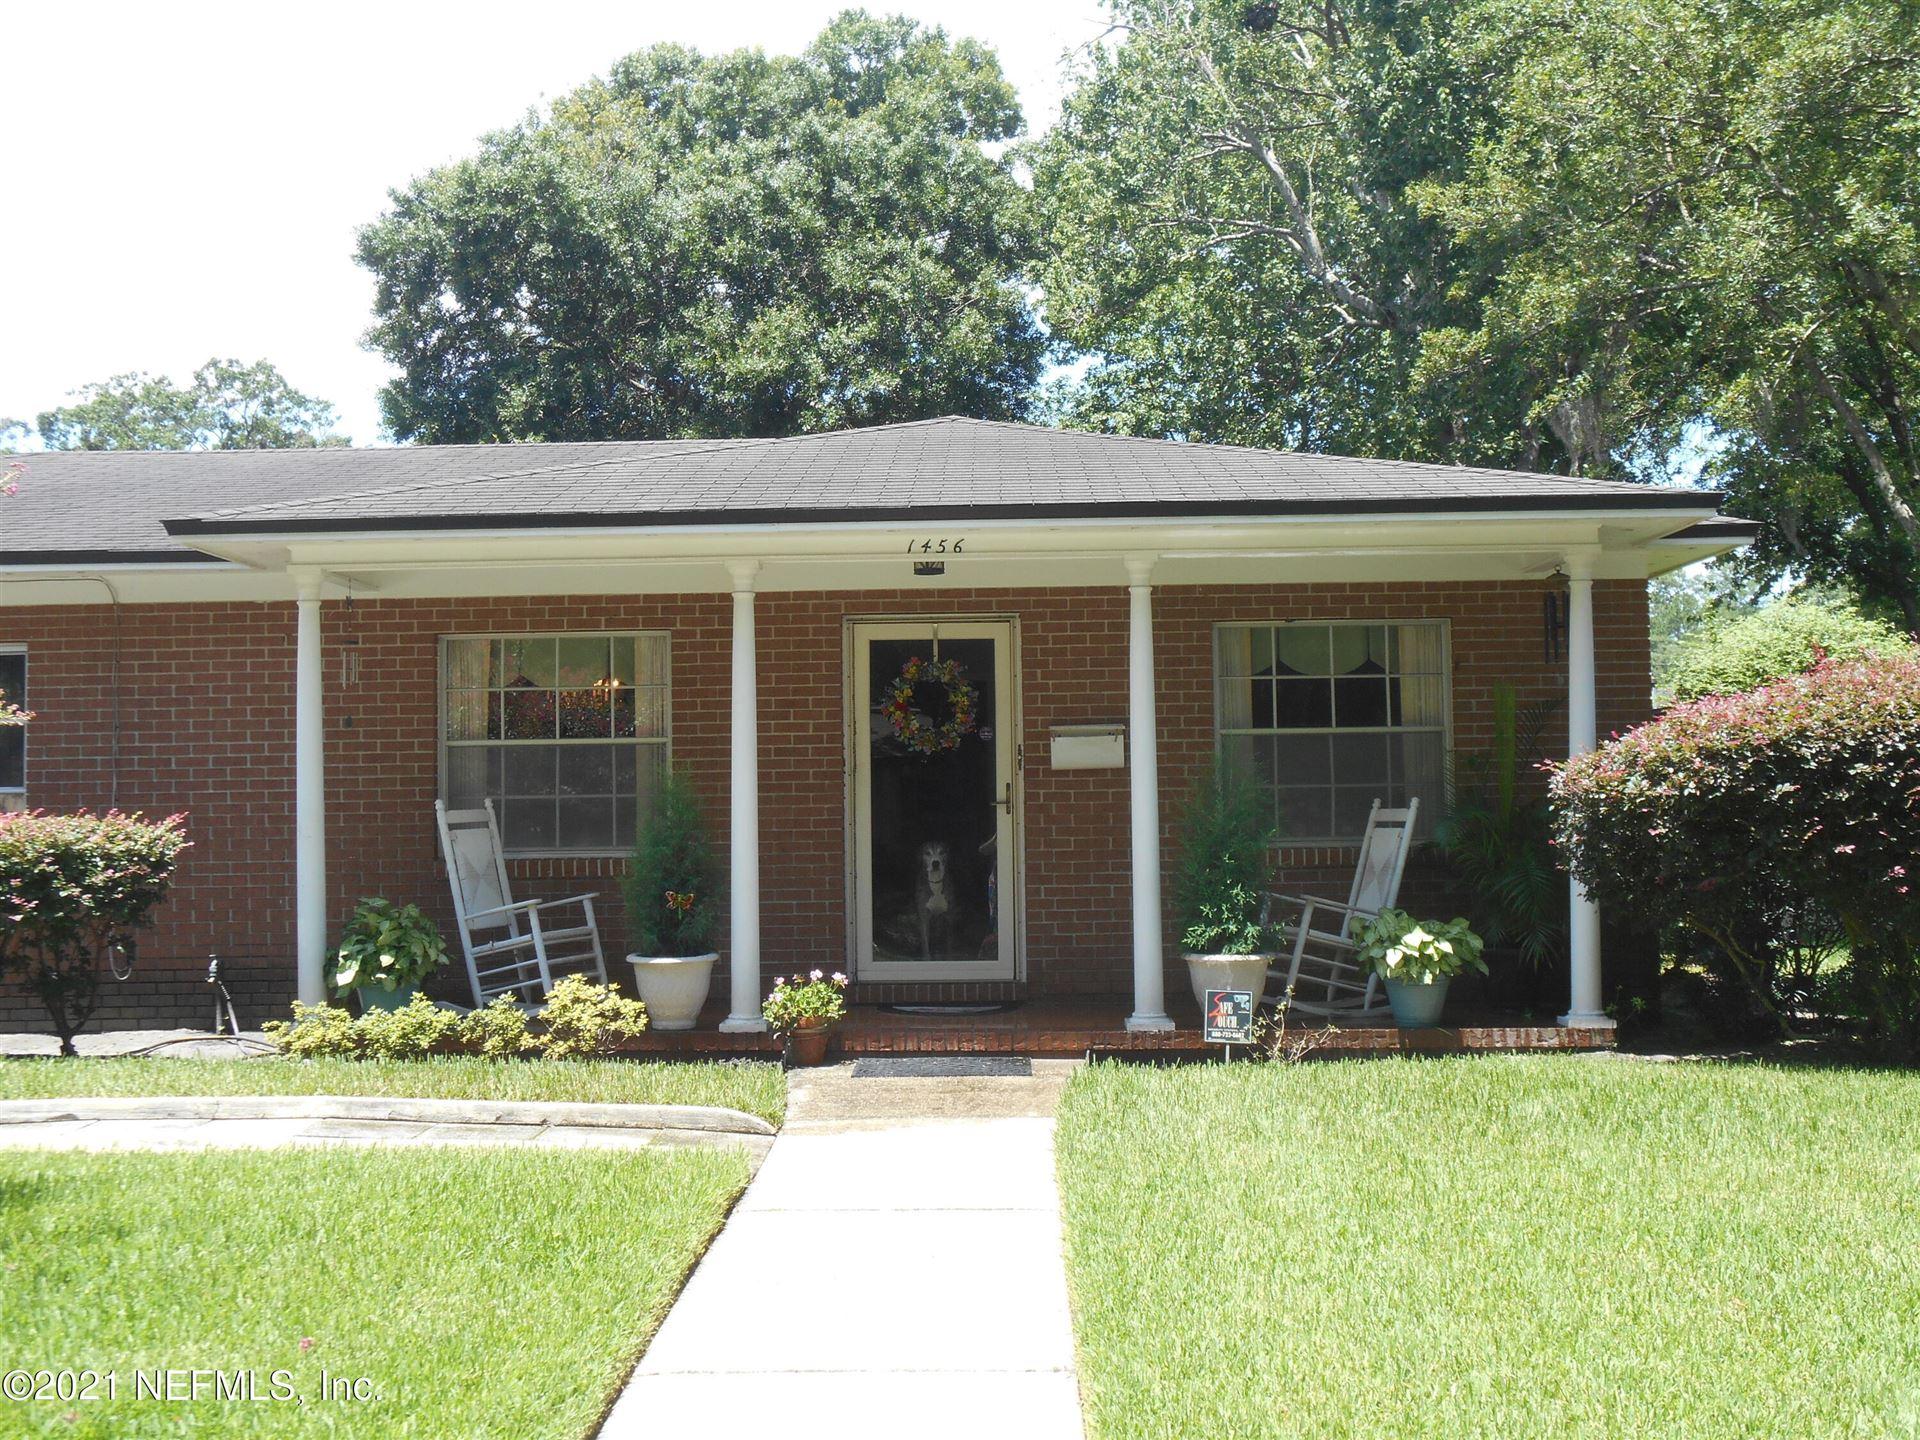 1456 DANBURY RD #Lot No: 65x140, Jacksonville, FL 32205 - MLS#: 1120609